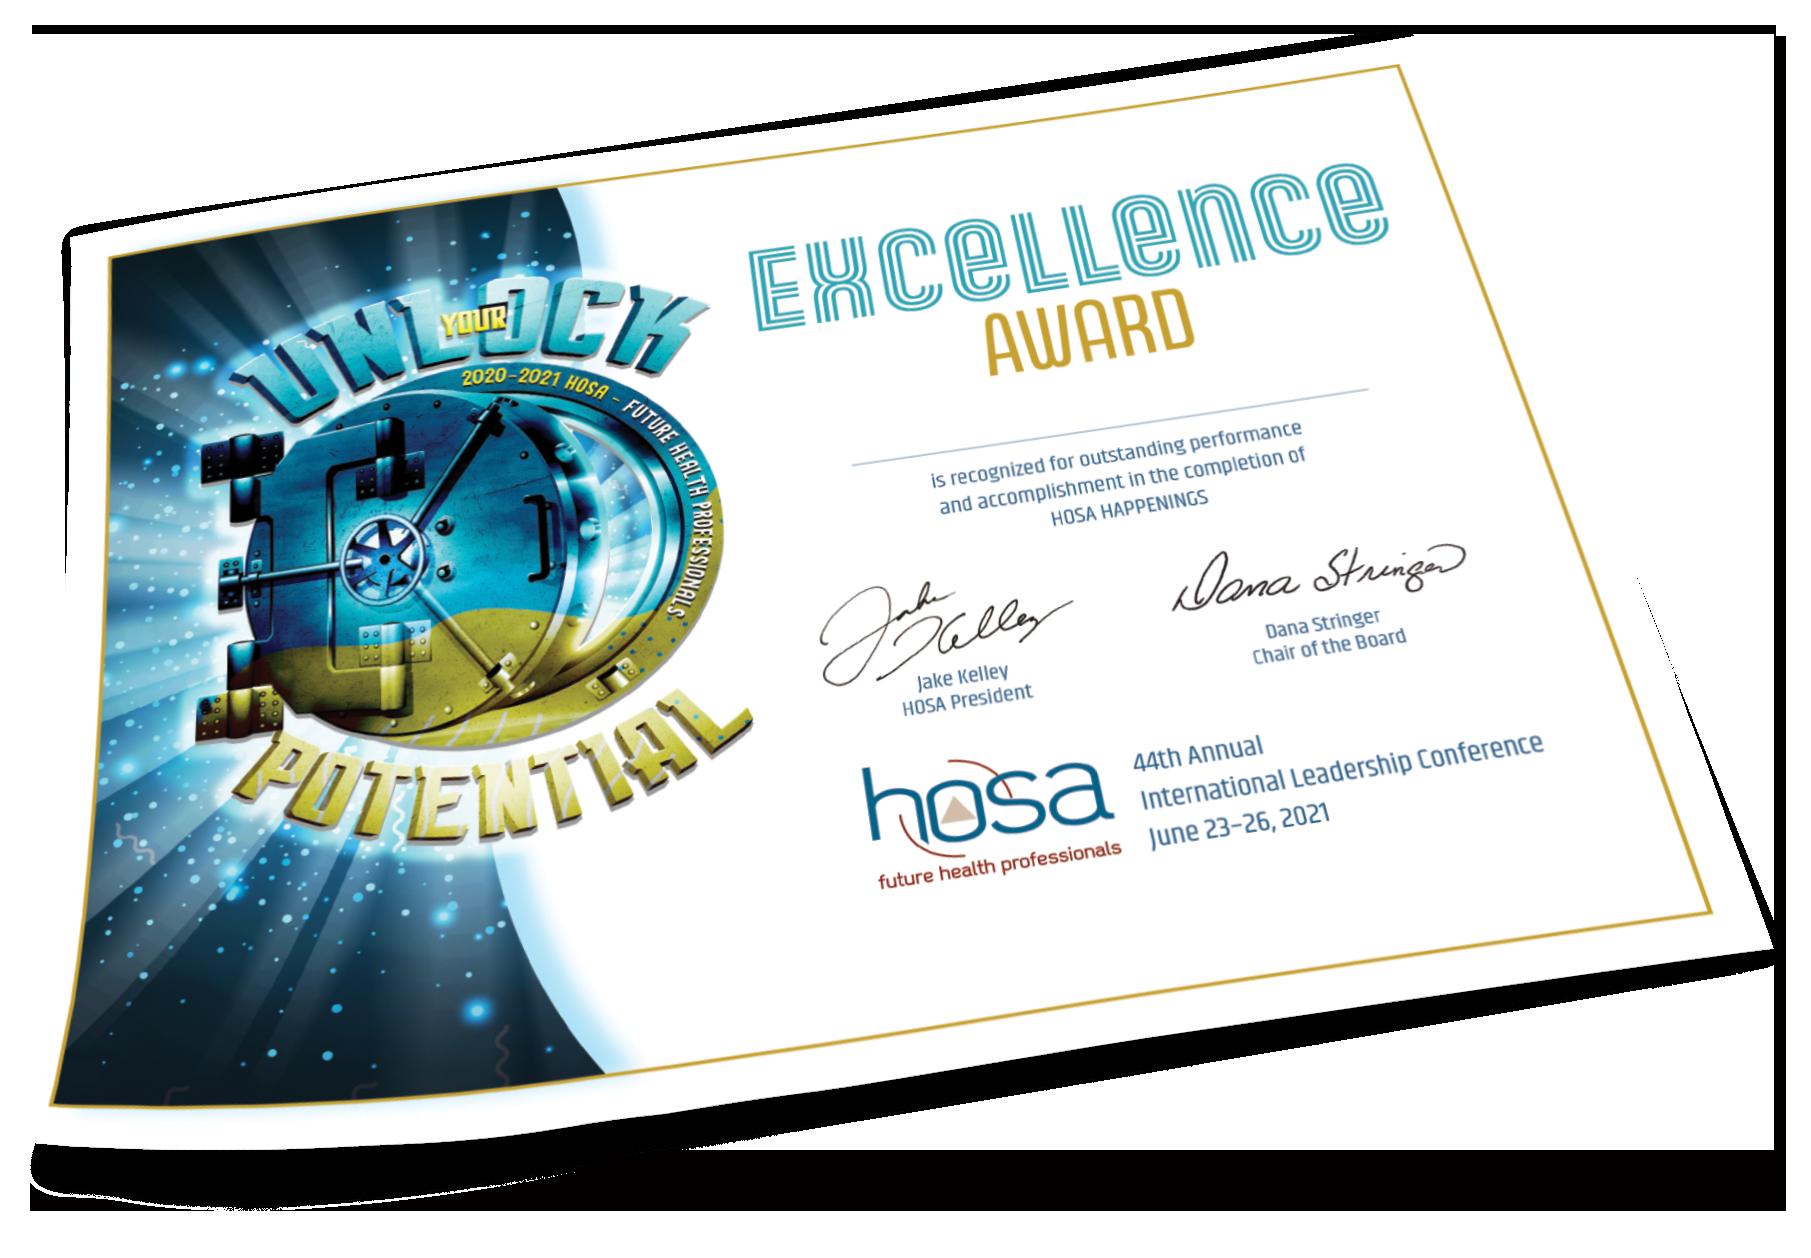 2021 Virtual International Leadership Conference Certificates